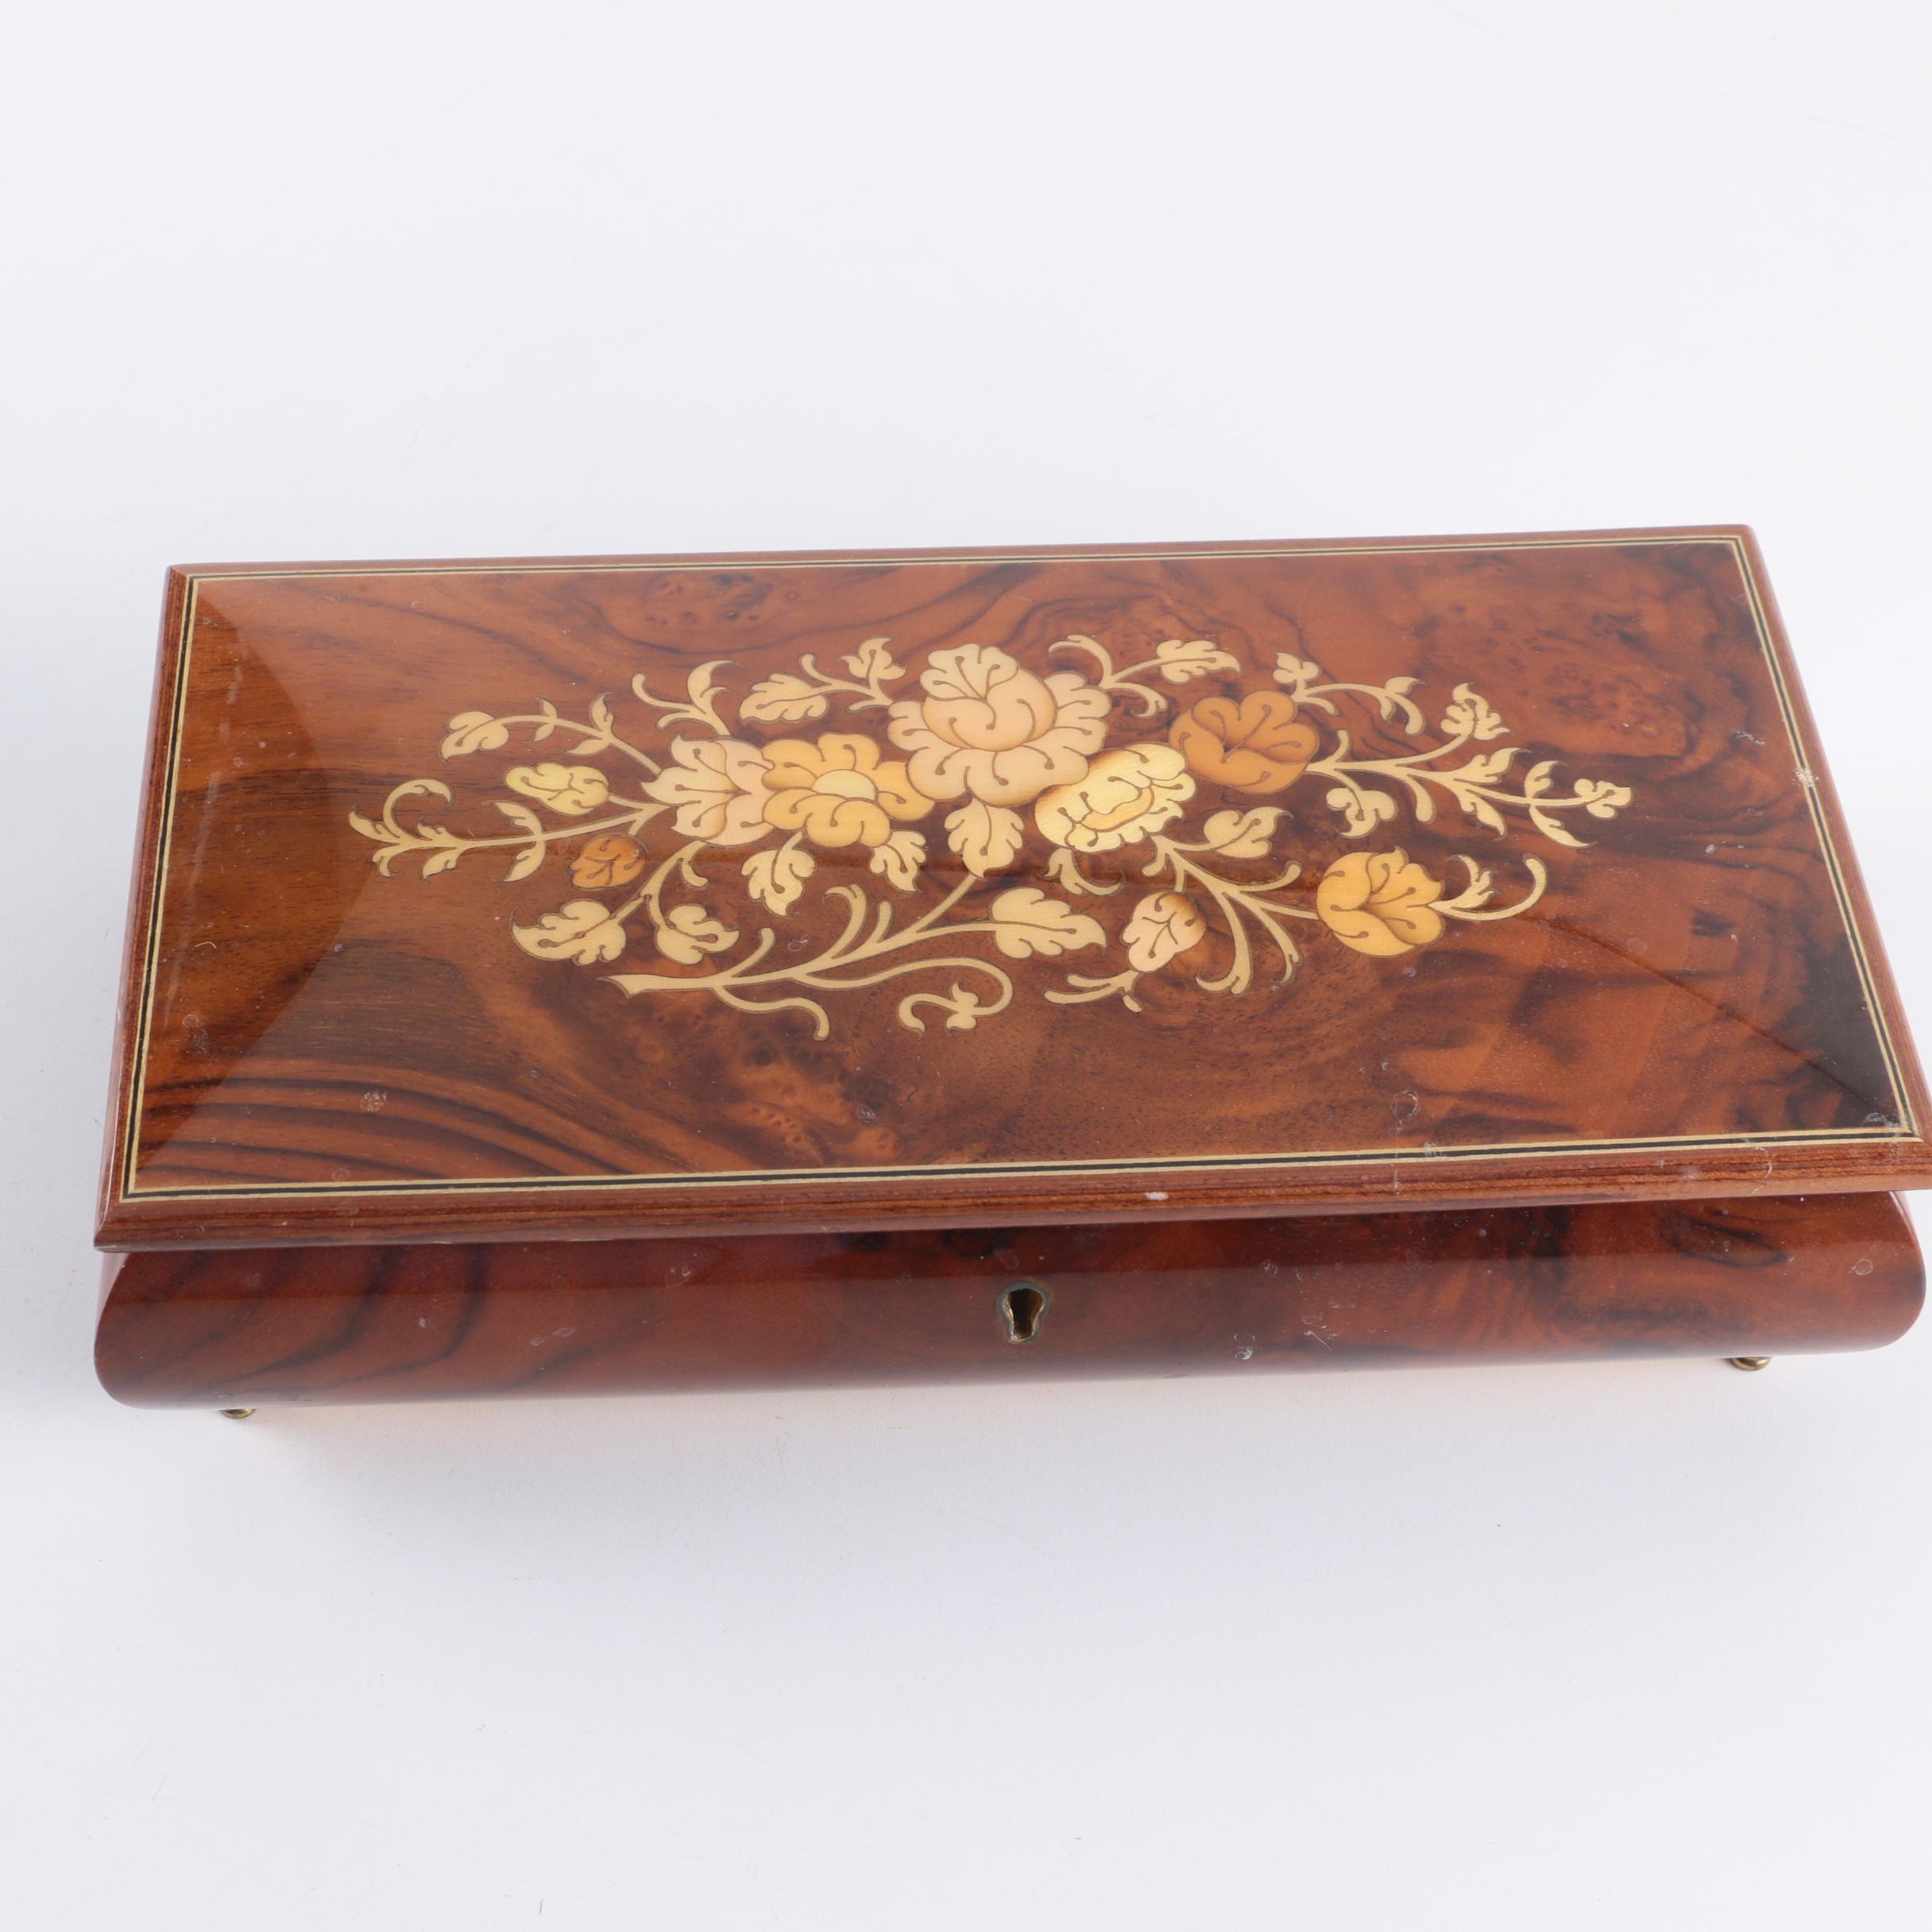 Italian Wooden Music Box